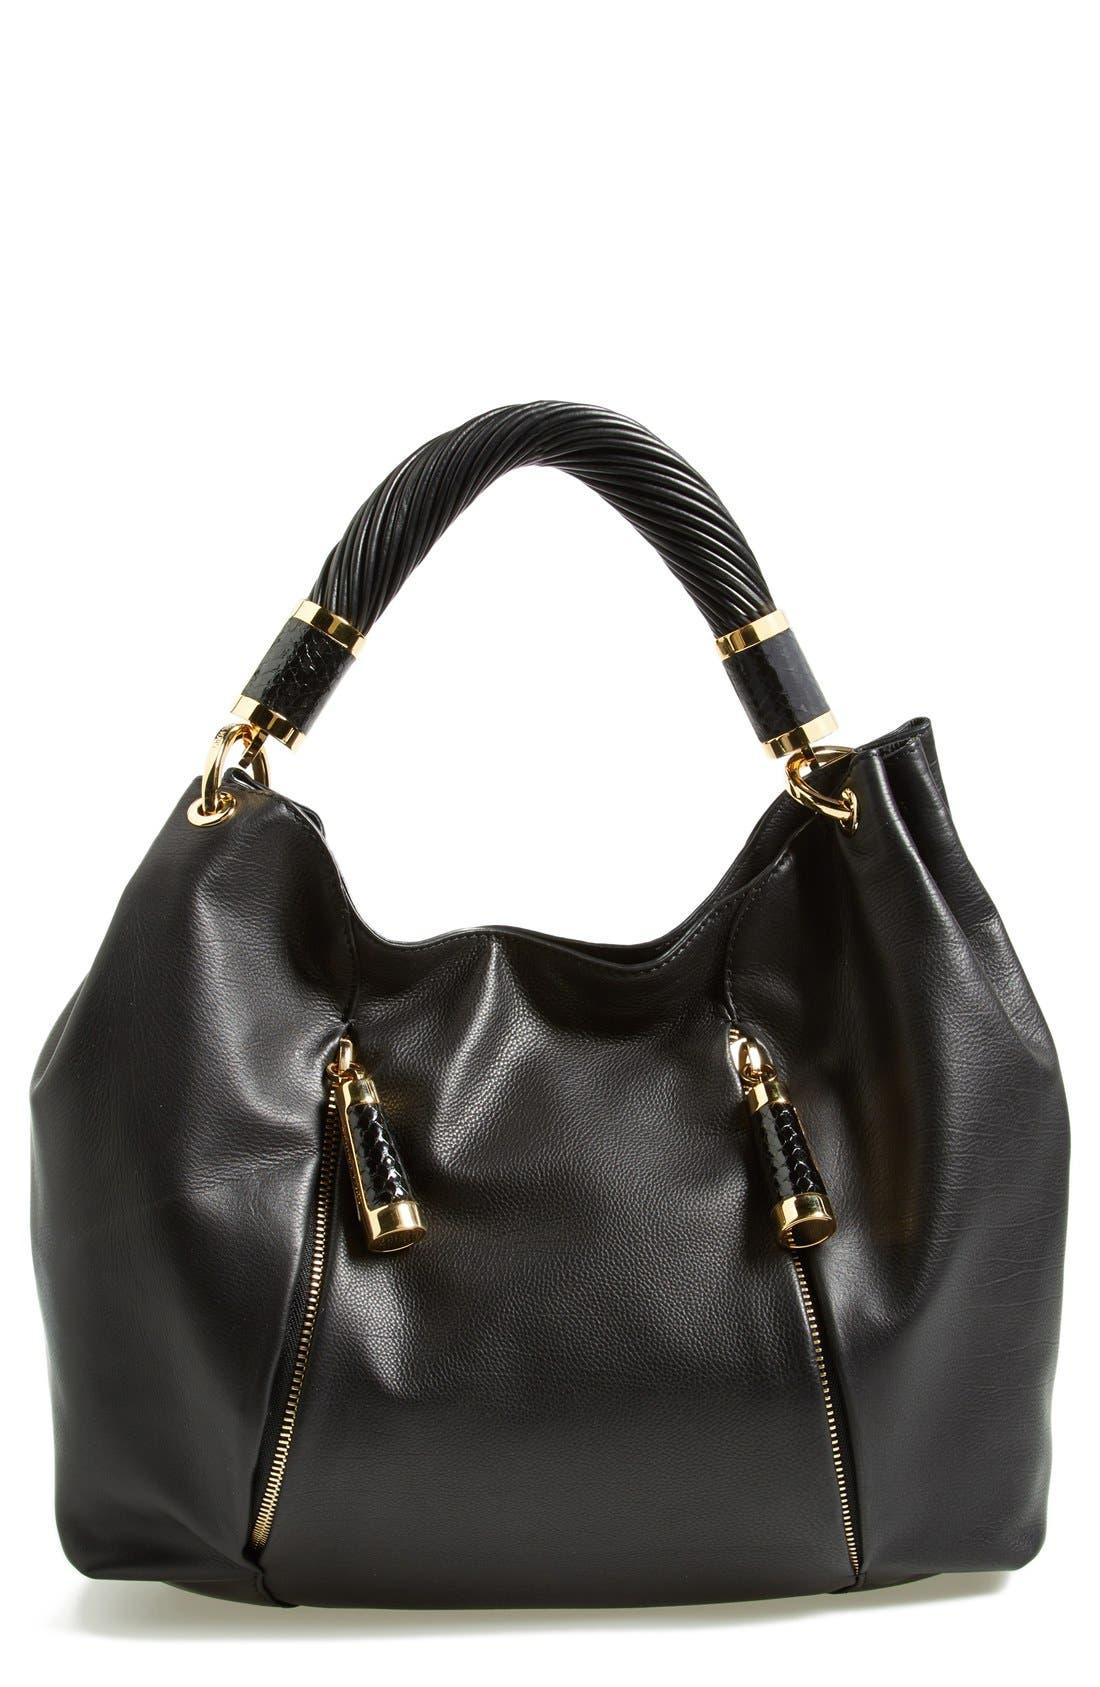 MICHAEL KORS 'Tonne' Leather Hobo, Main, color, 001